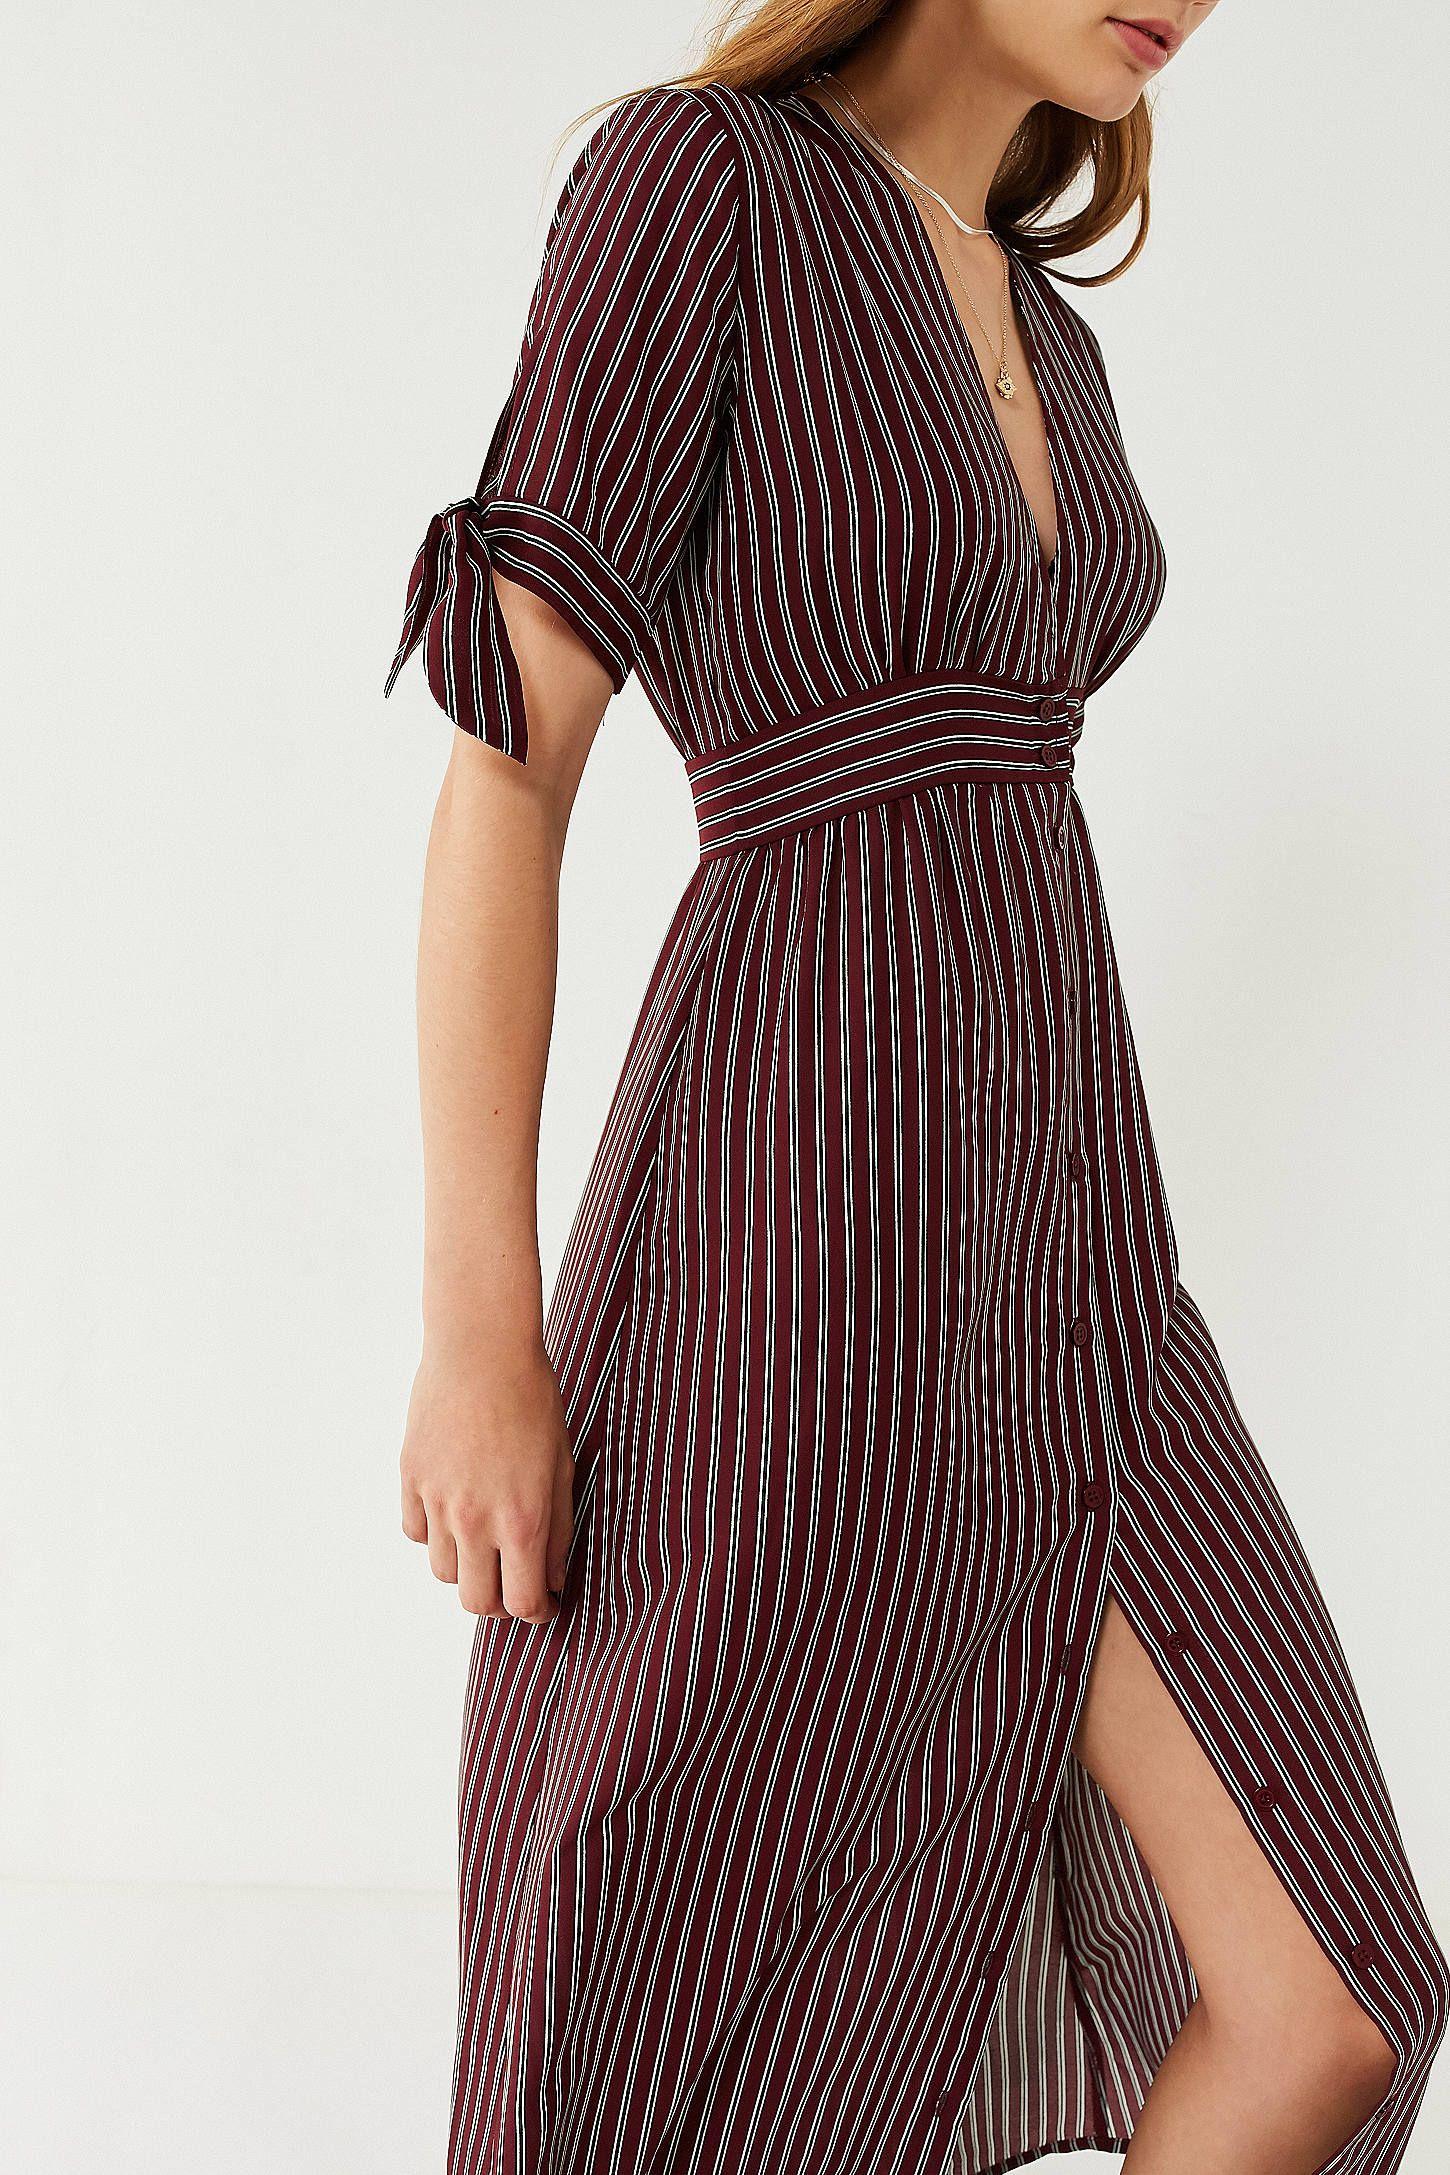 Uo Plunging Short Sleeve Striped Midi Dress Striped Midi Dress Dresses Midi Dress [ 2175 x 1450 Pixel ]